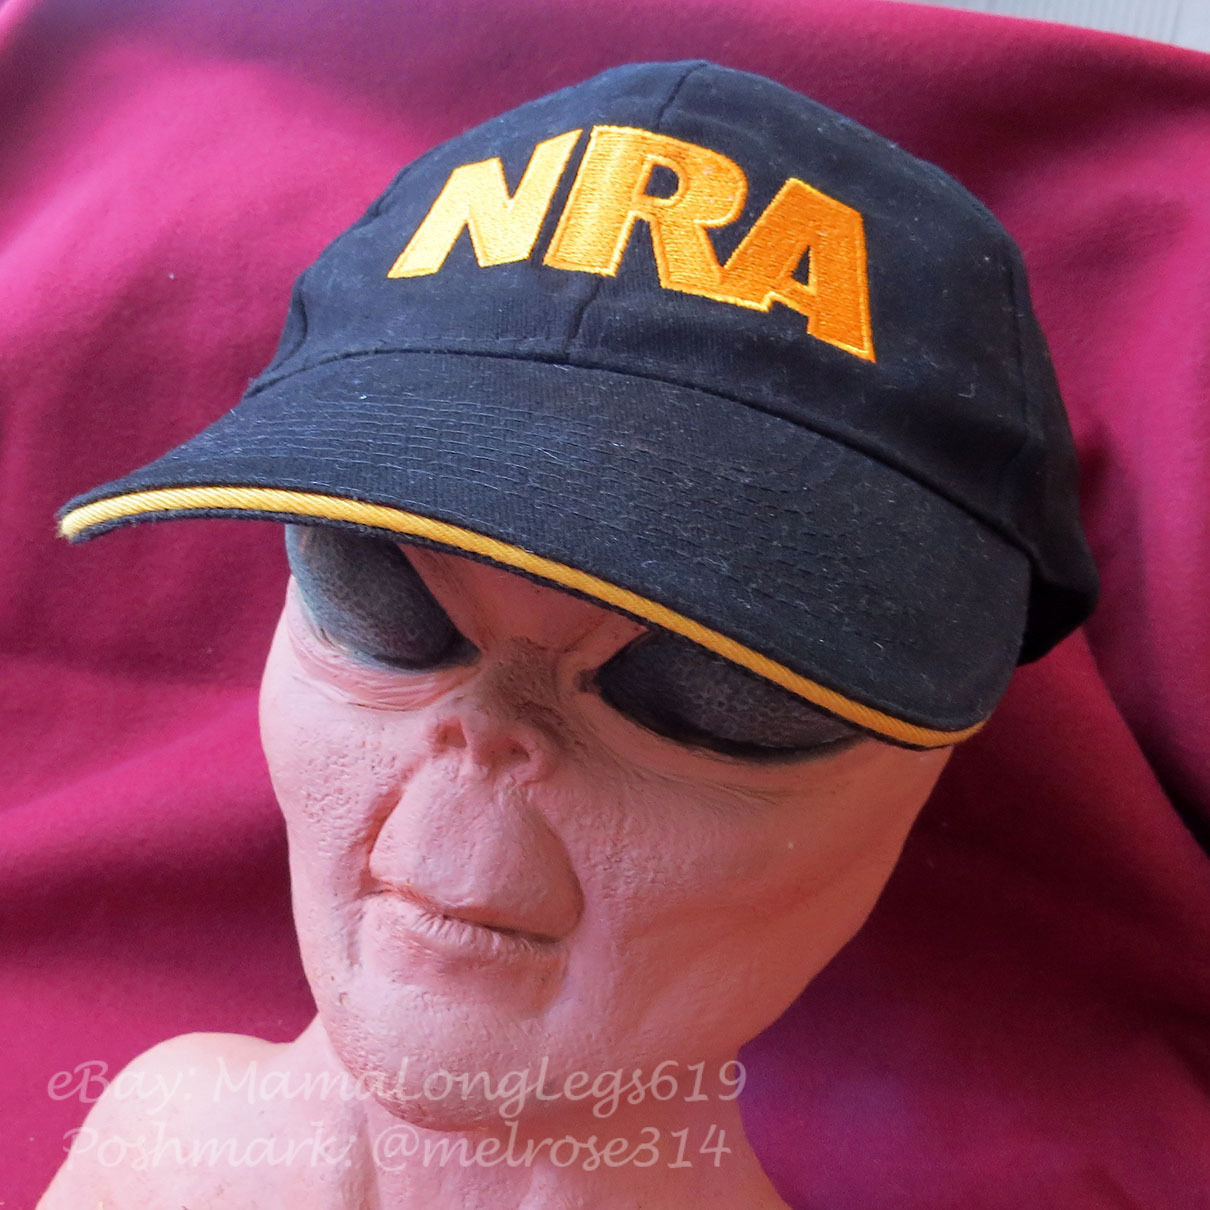 NRA Hat National Rifle Association Member S.A.T.F Snapback Eagle American Flag